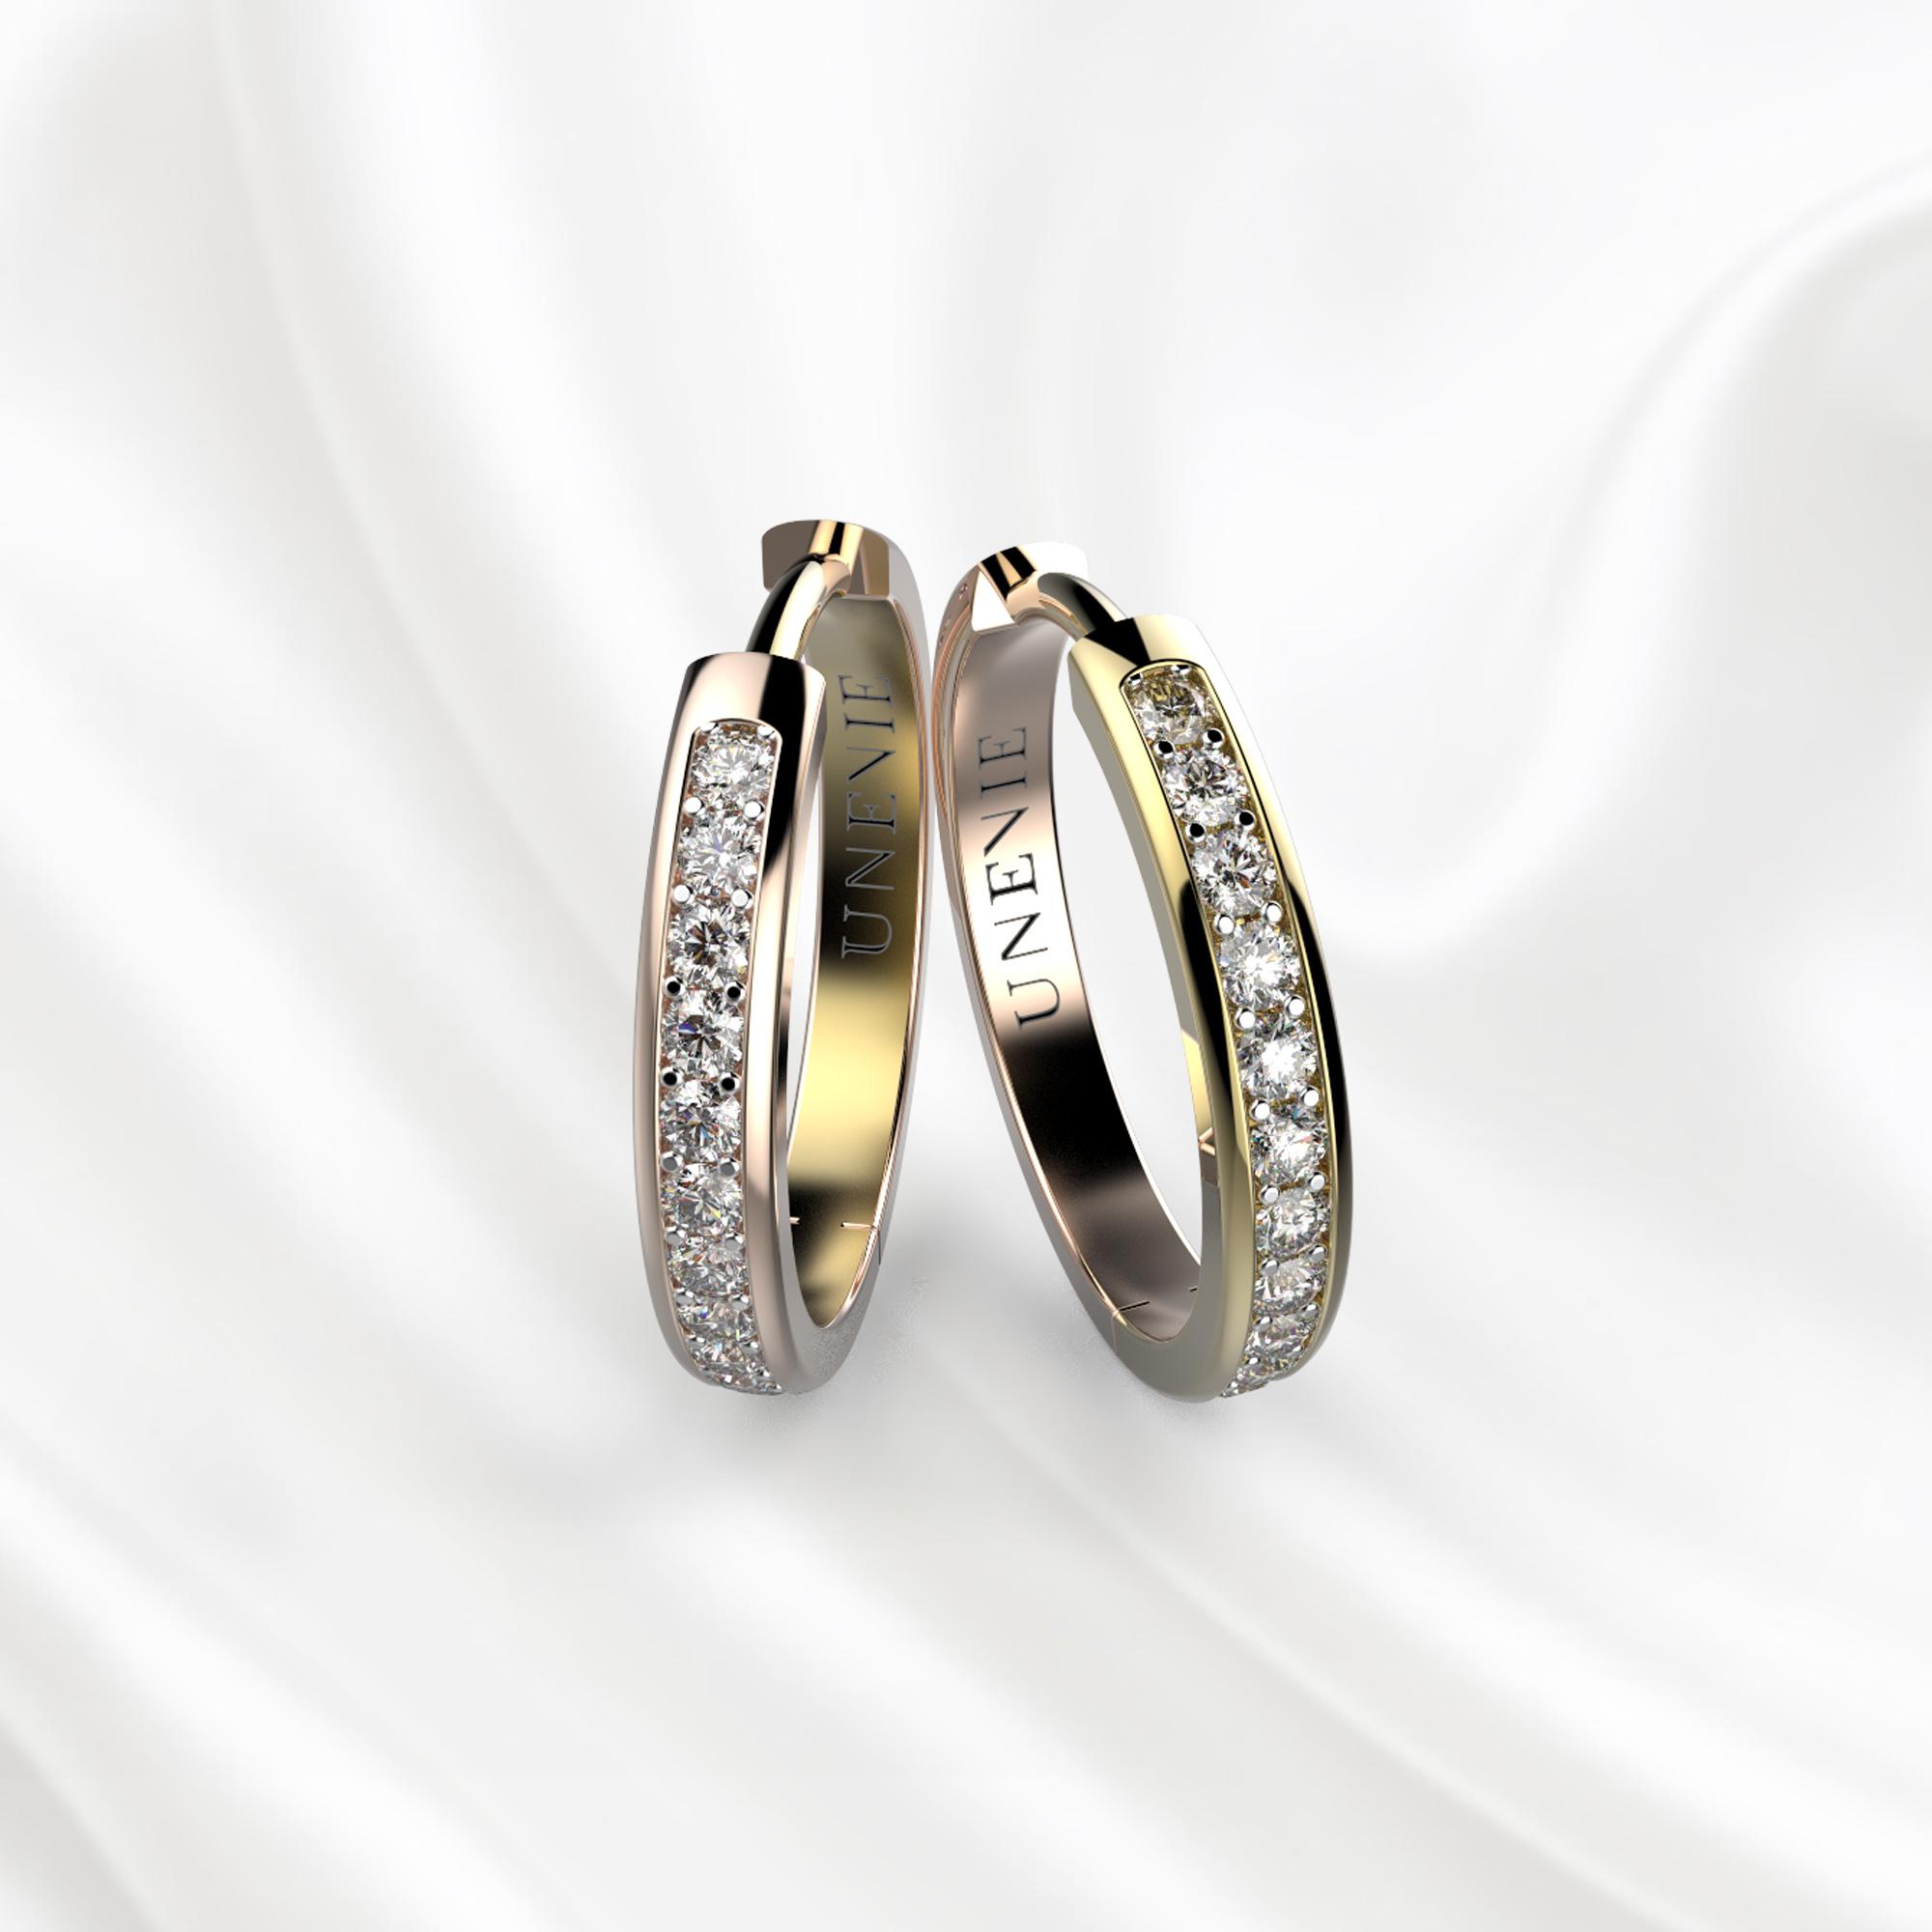 S9 Серьги из розово-желтого золота с 44 бриллиантами